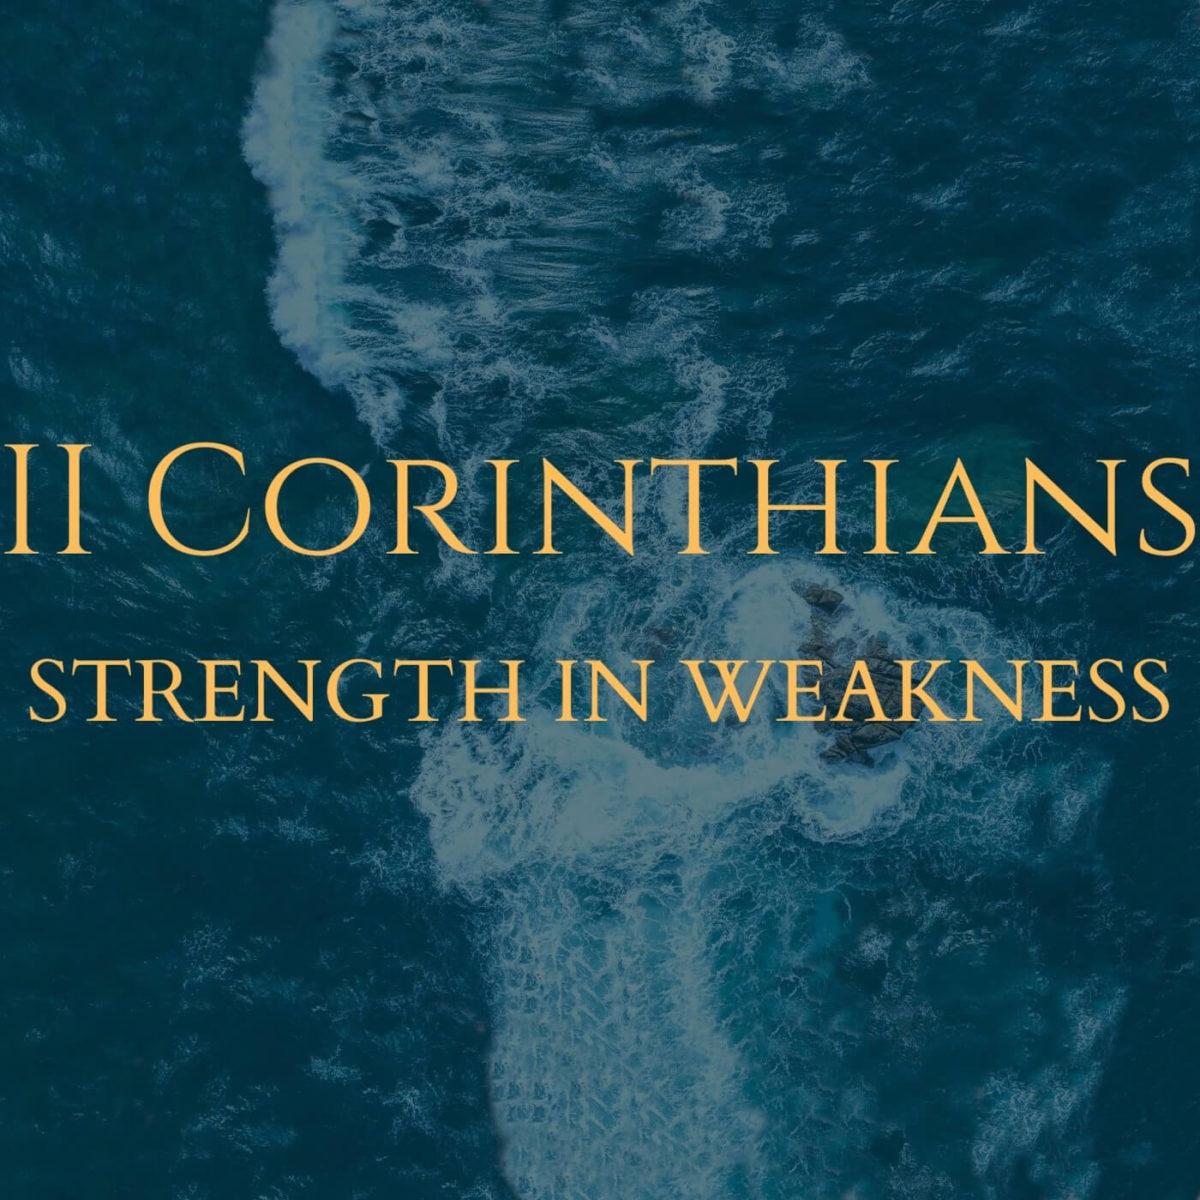 II Corinthians 13:1-10